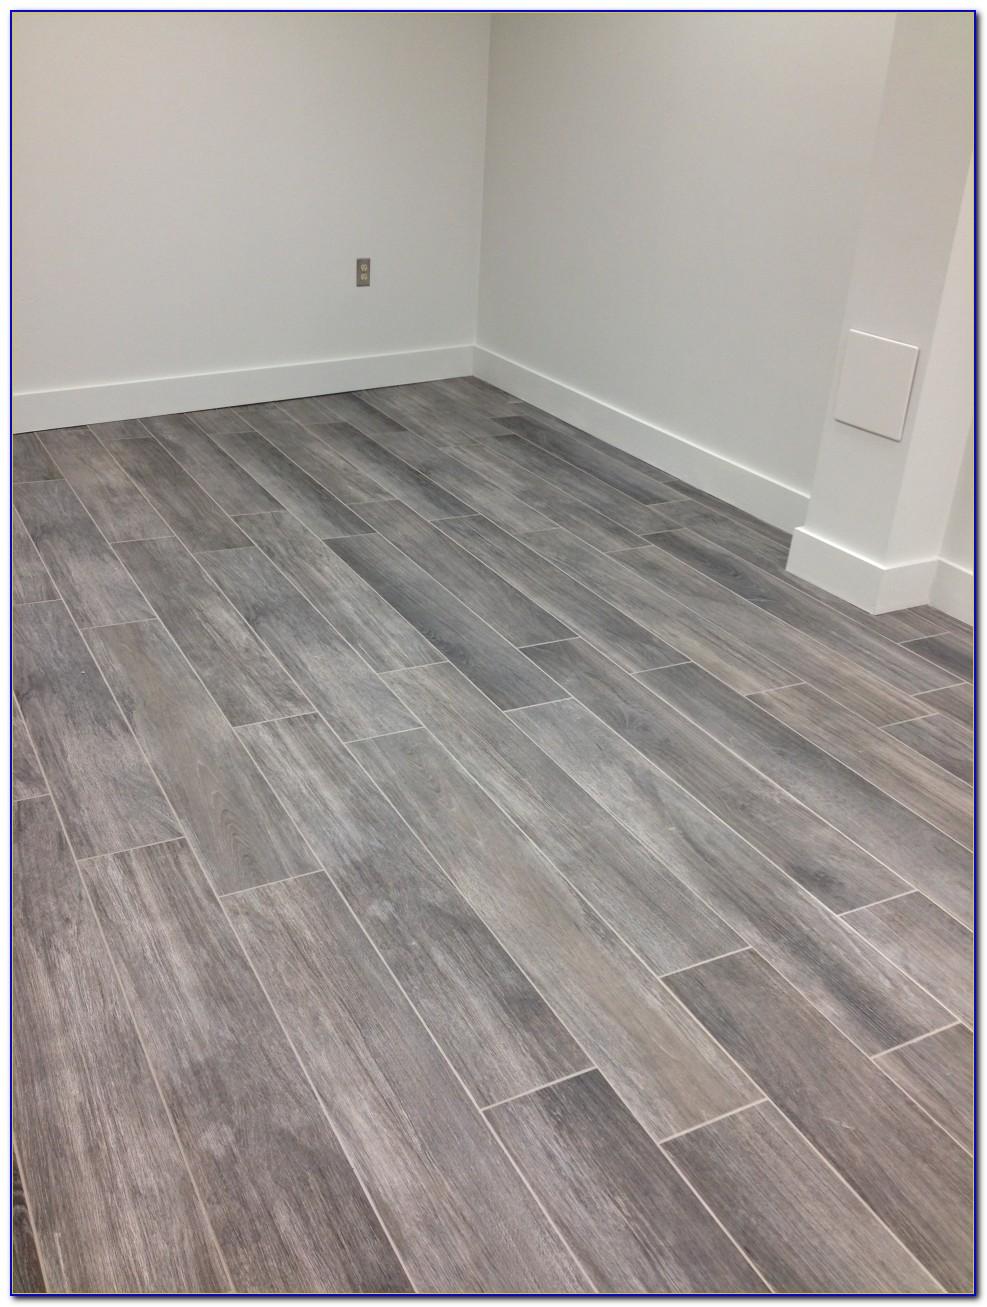 Grey Porcelain Floor Tiles B Q Tiles Home Design Ideas Mpklww8yxn